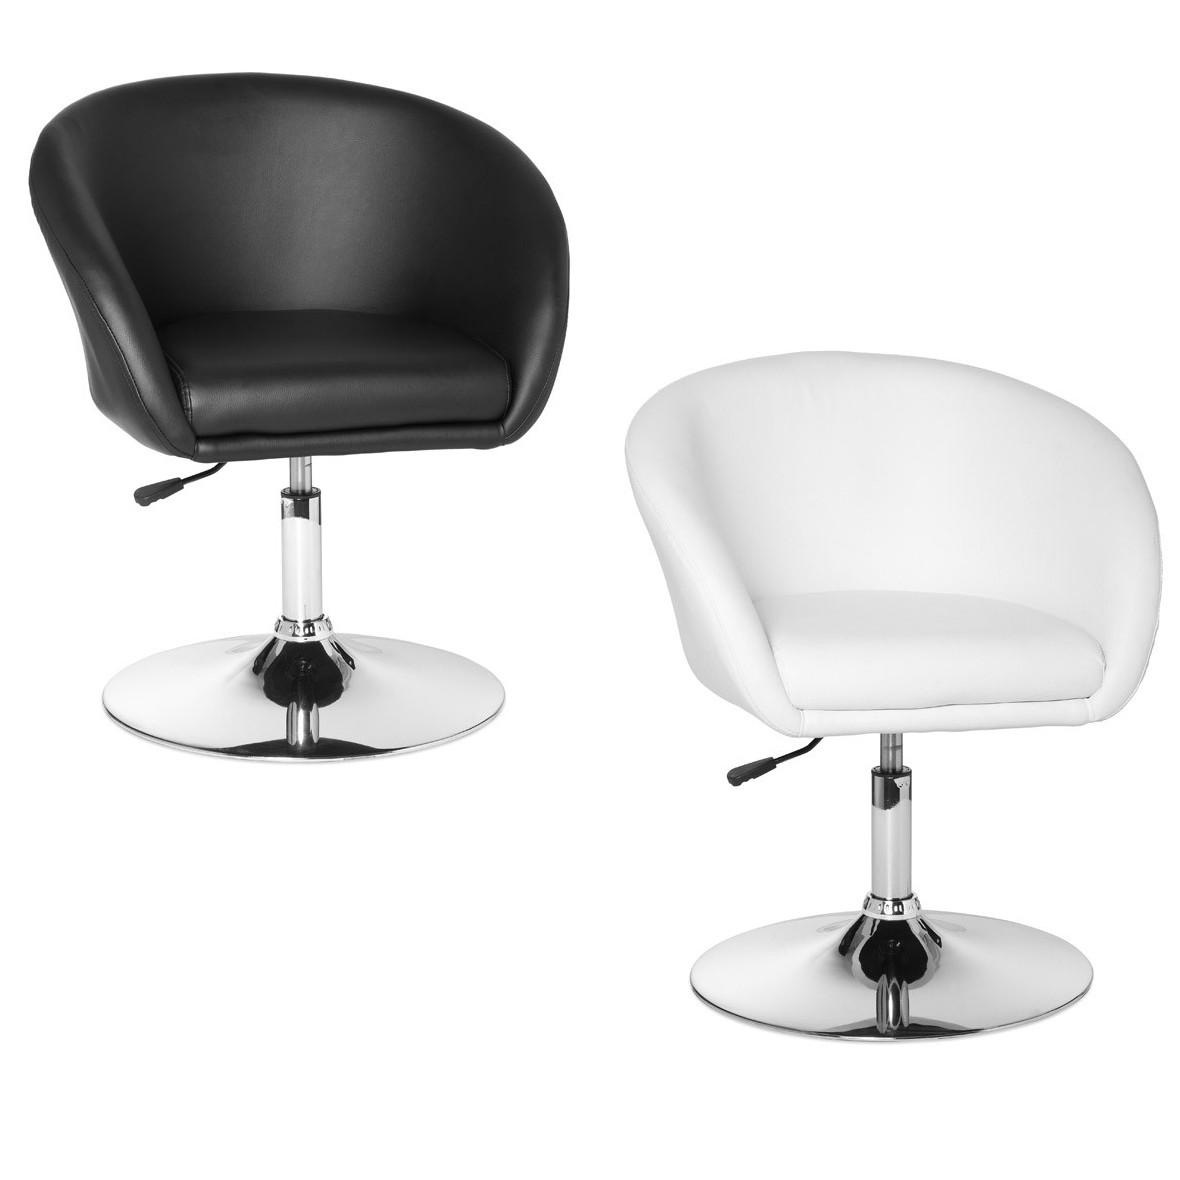 Verschiedene Lounge Sessel Leder Sammlung Von Finebuy Relaxsessel Pump Loungesessel Bezug Kunstleder Farbe